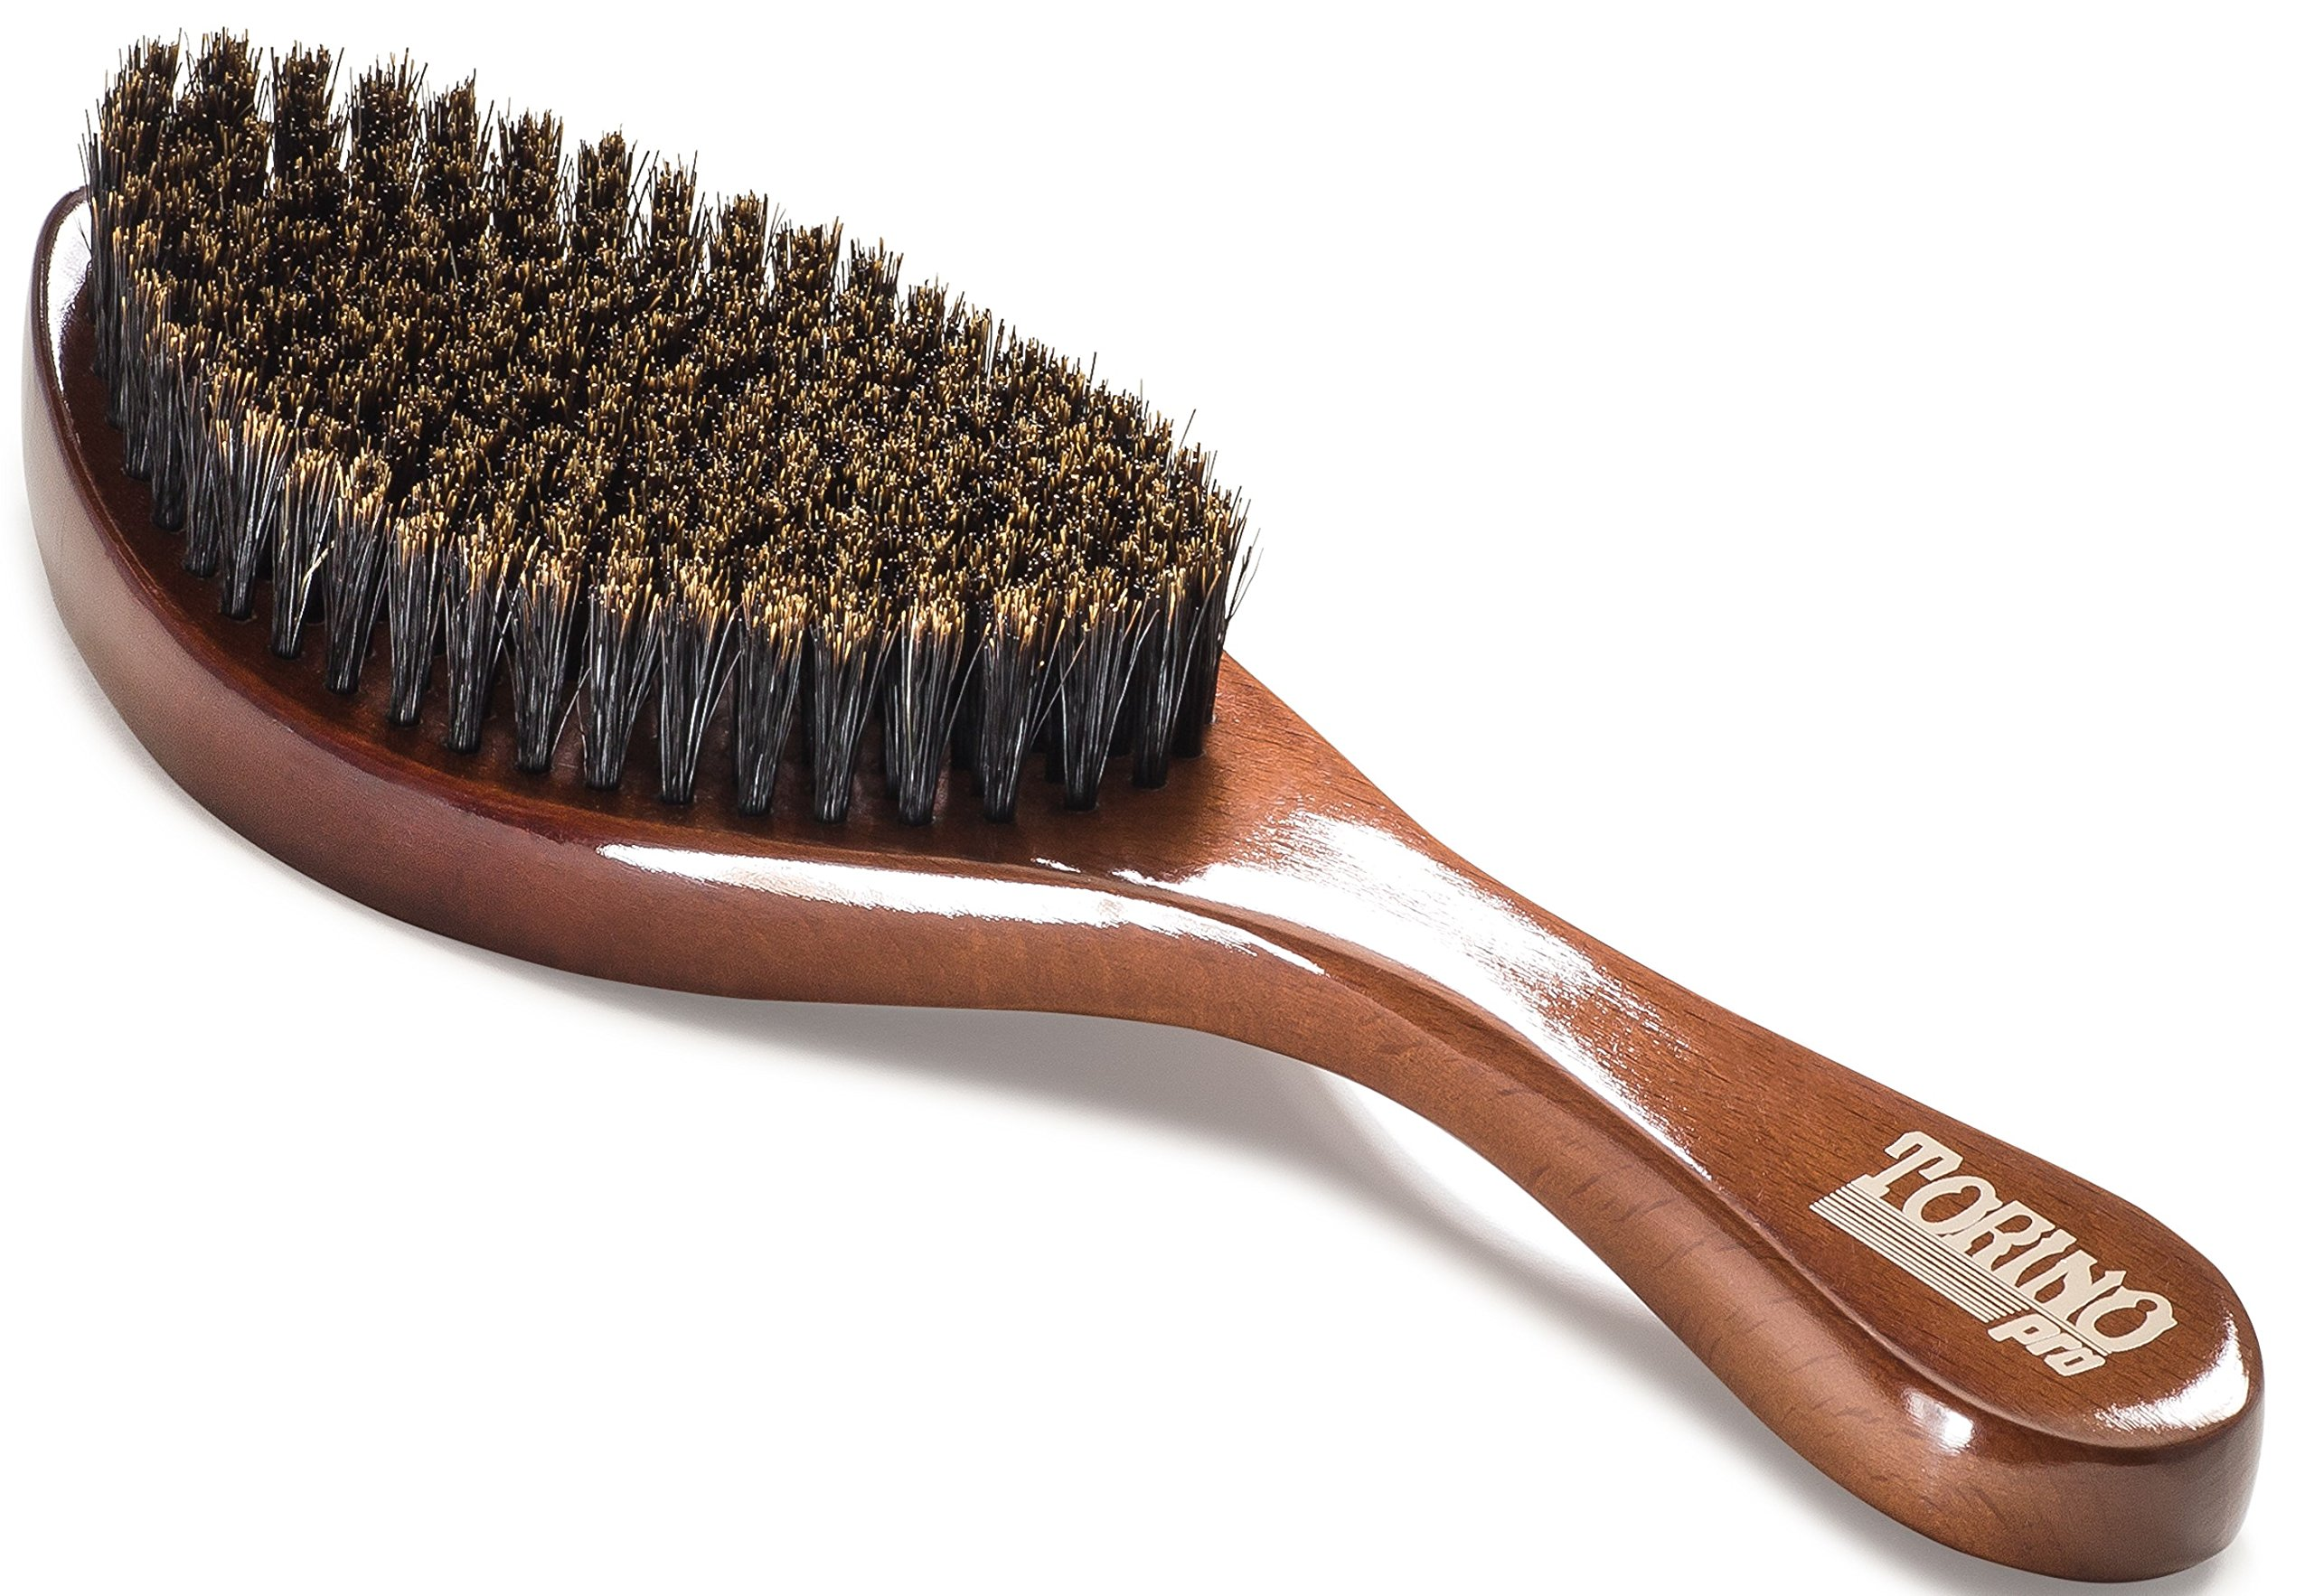 Torino Pro Wave Brush #620 By Brush King - Medium Soft Curve 360 Waves Brush